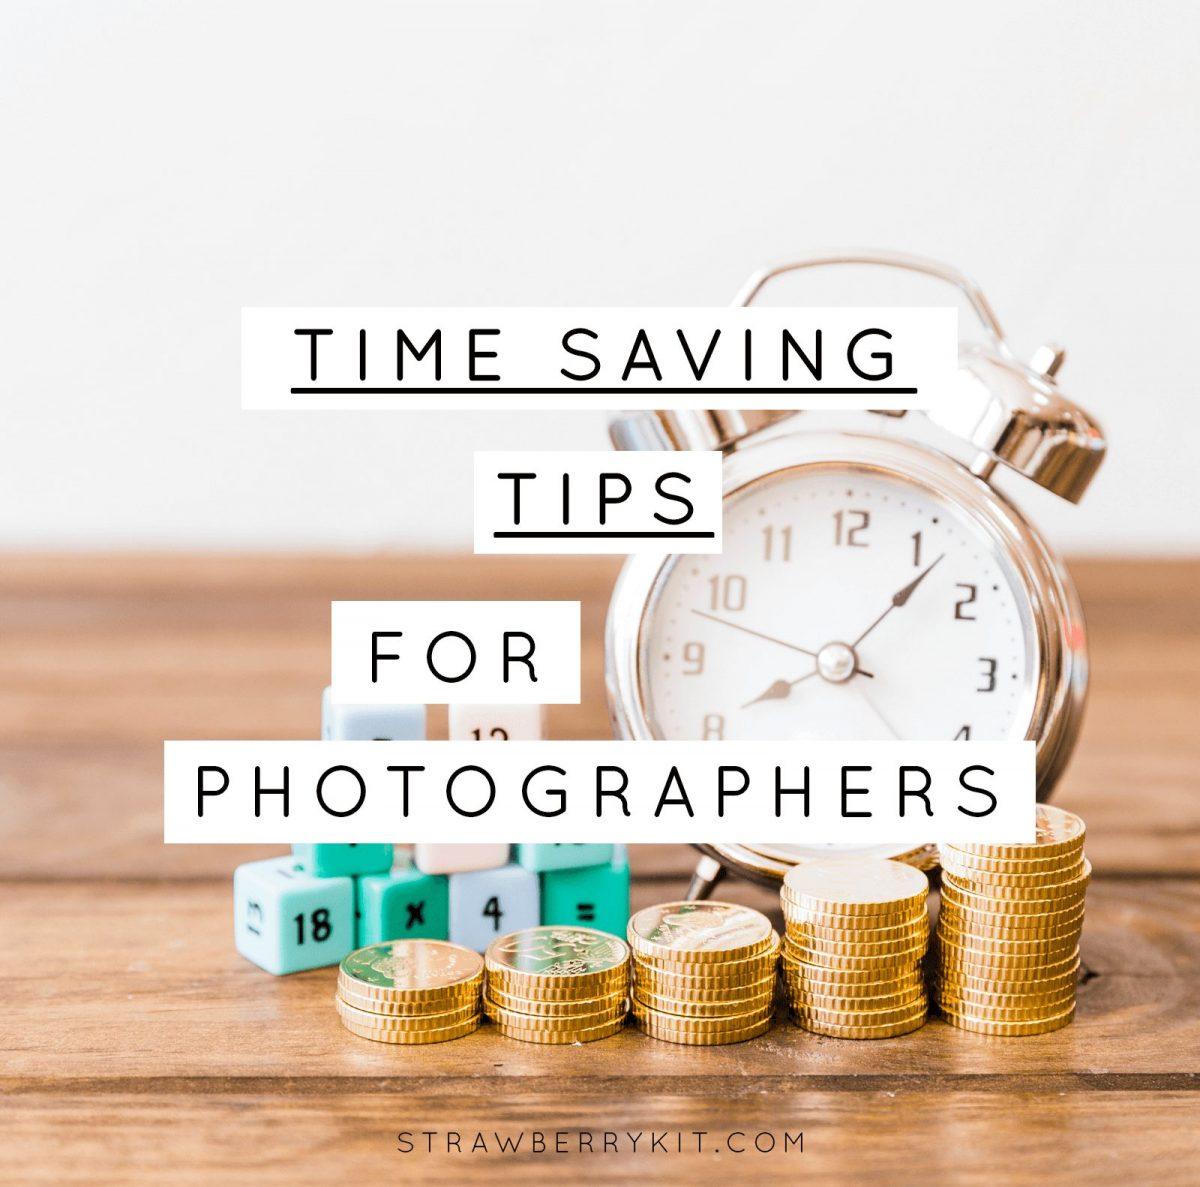 Time Saving for Photographers